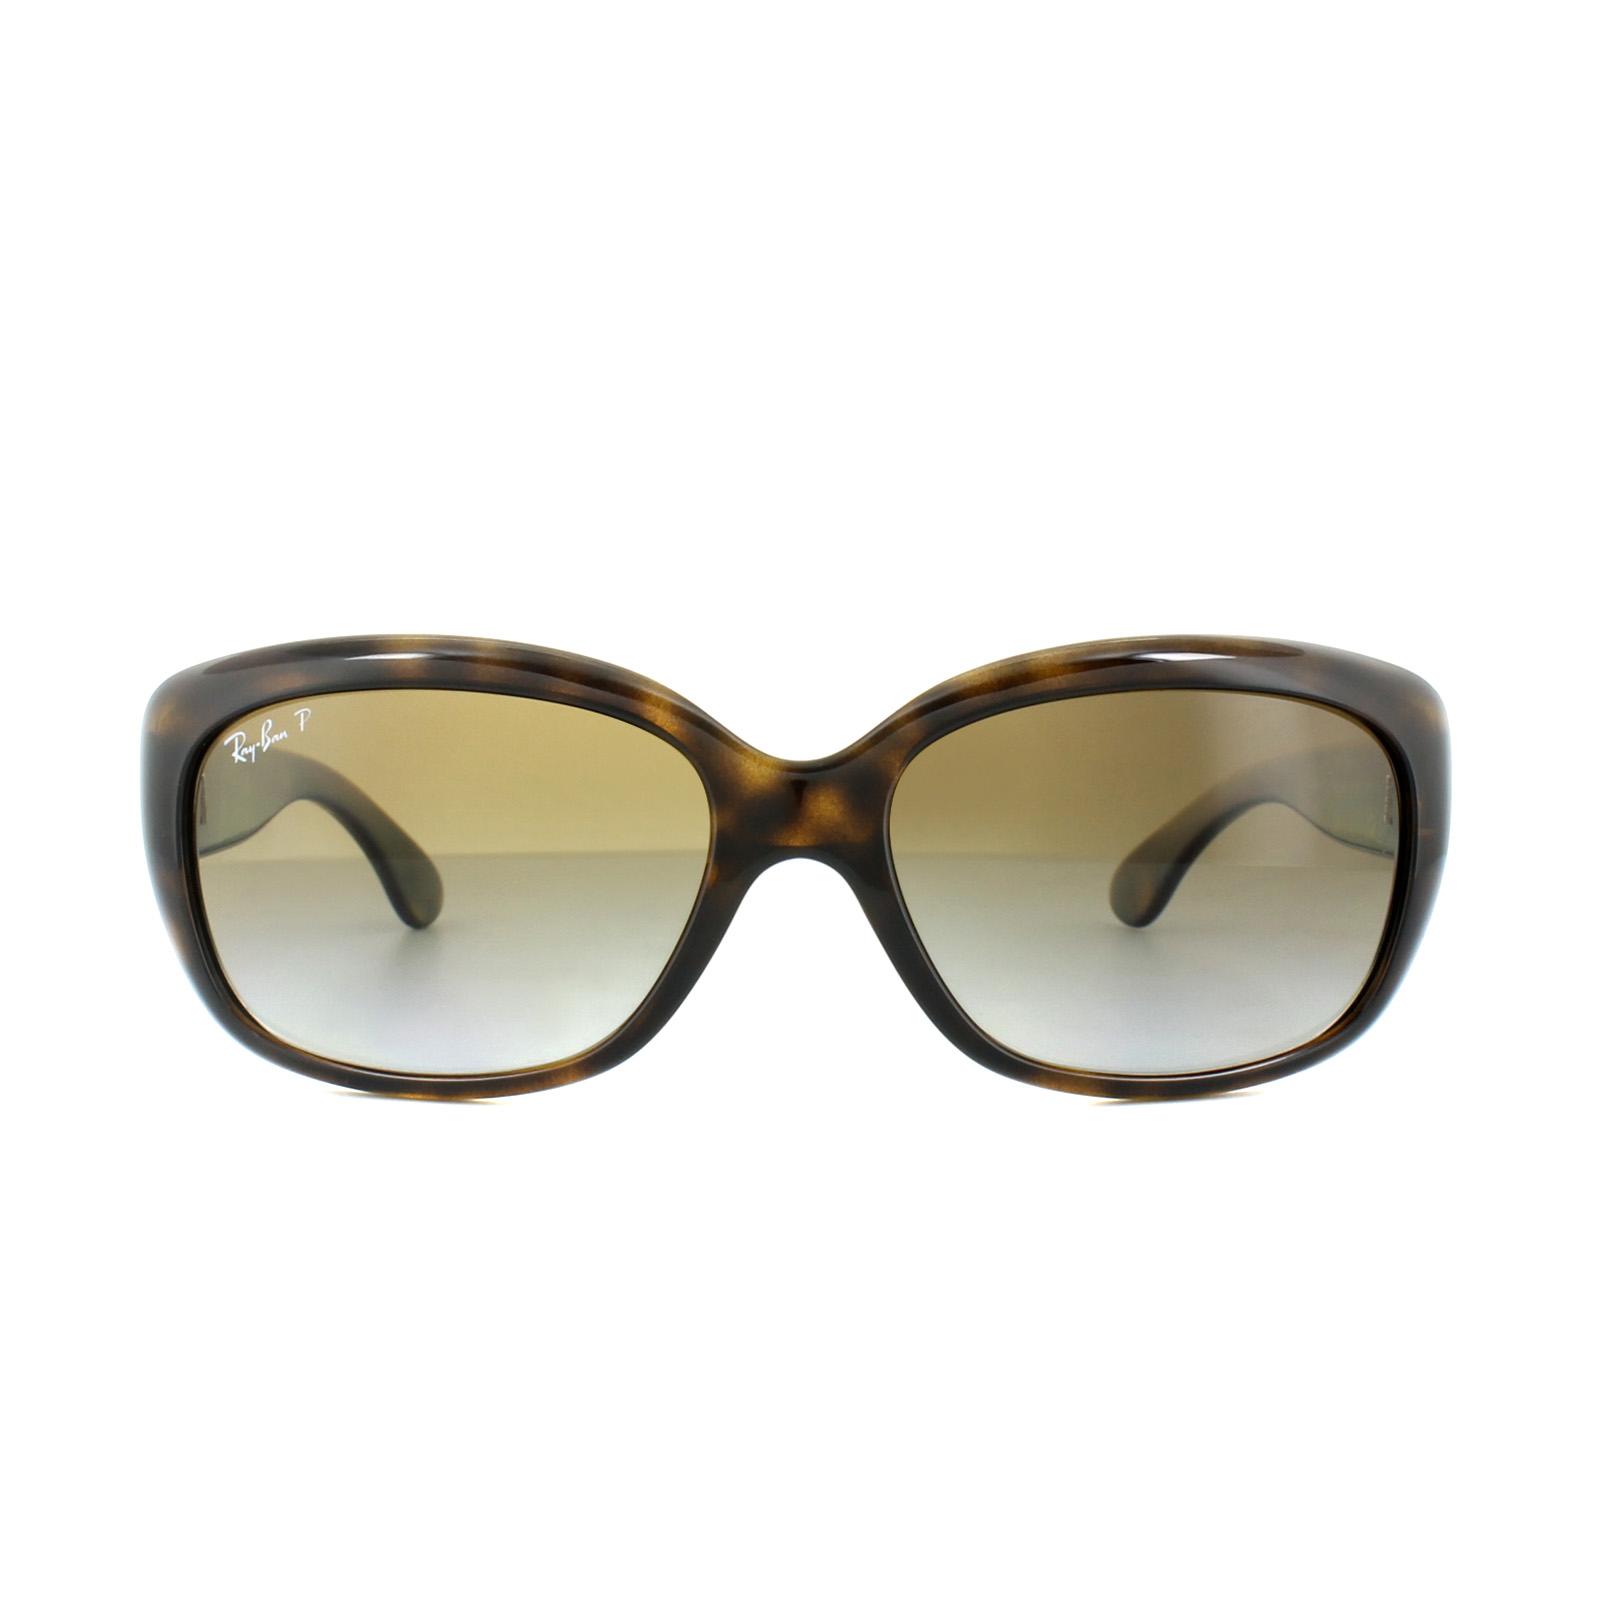 b0ee73e3e6e Sentinel Ray-Ban Sunglasses Jackie Ohh 4101 710 T5 Tortoise Brown Gradient  Polarized